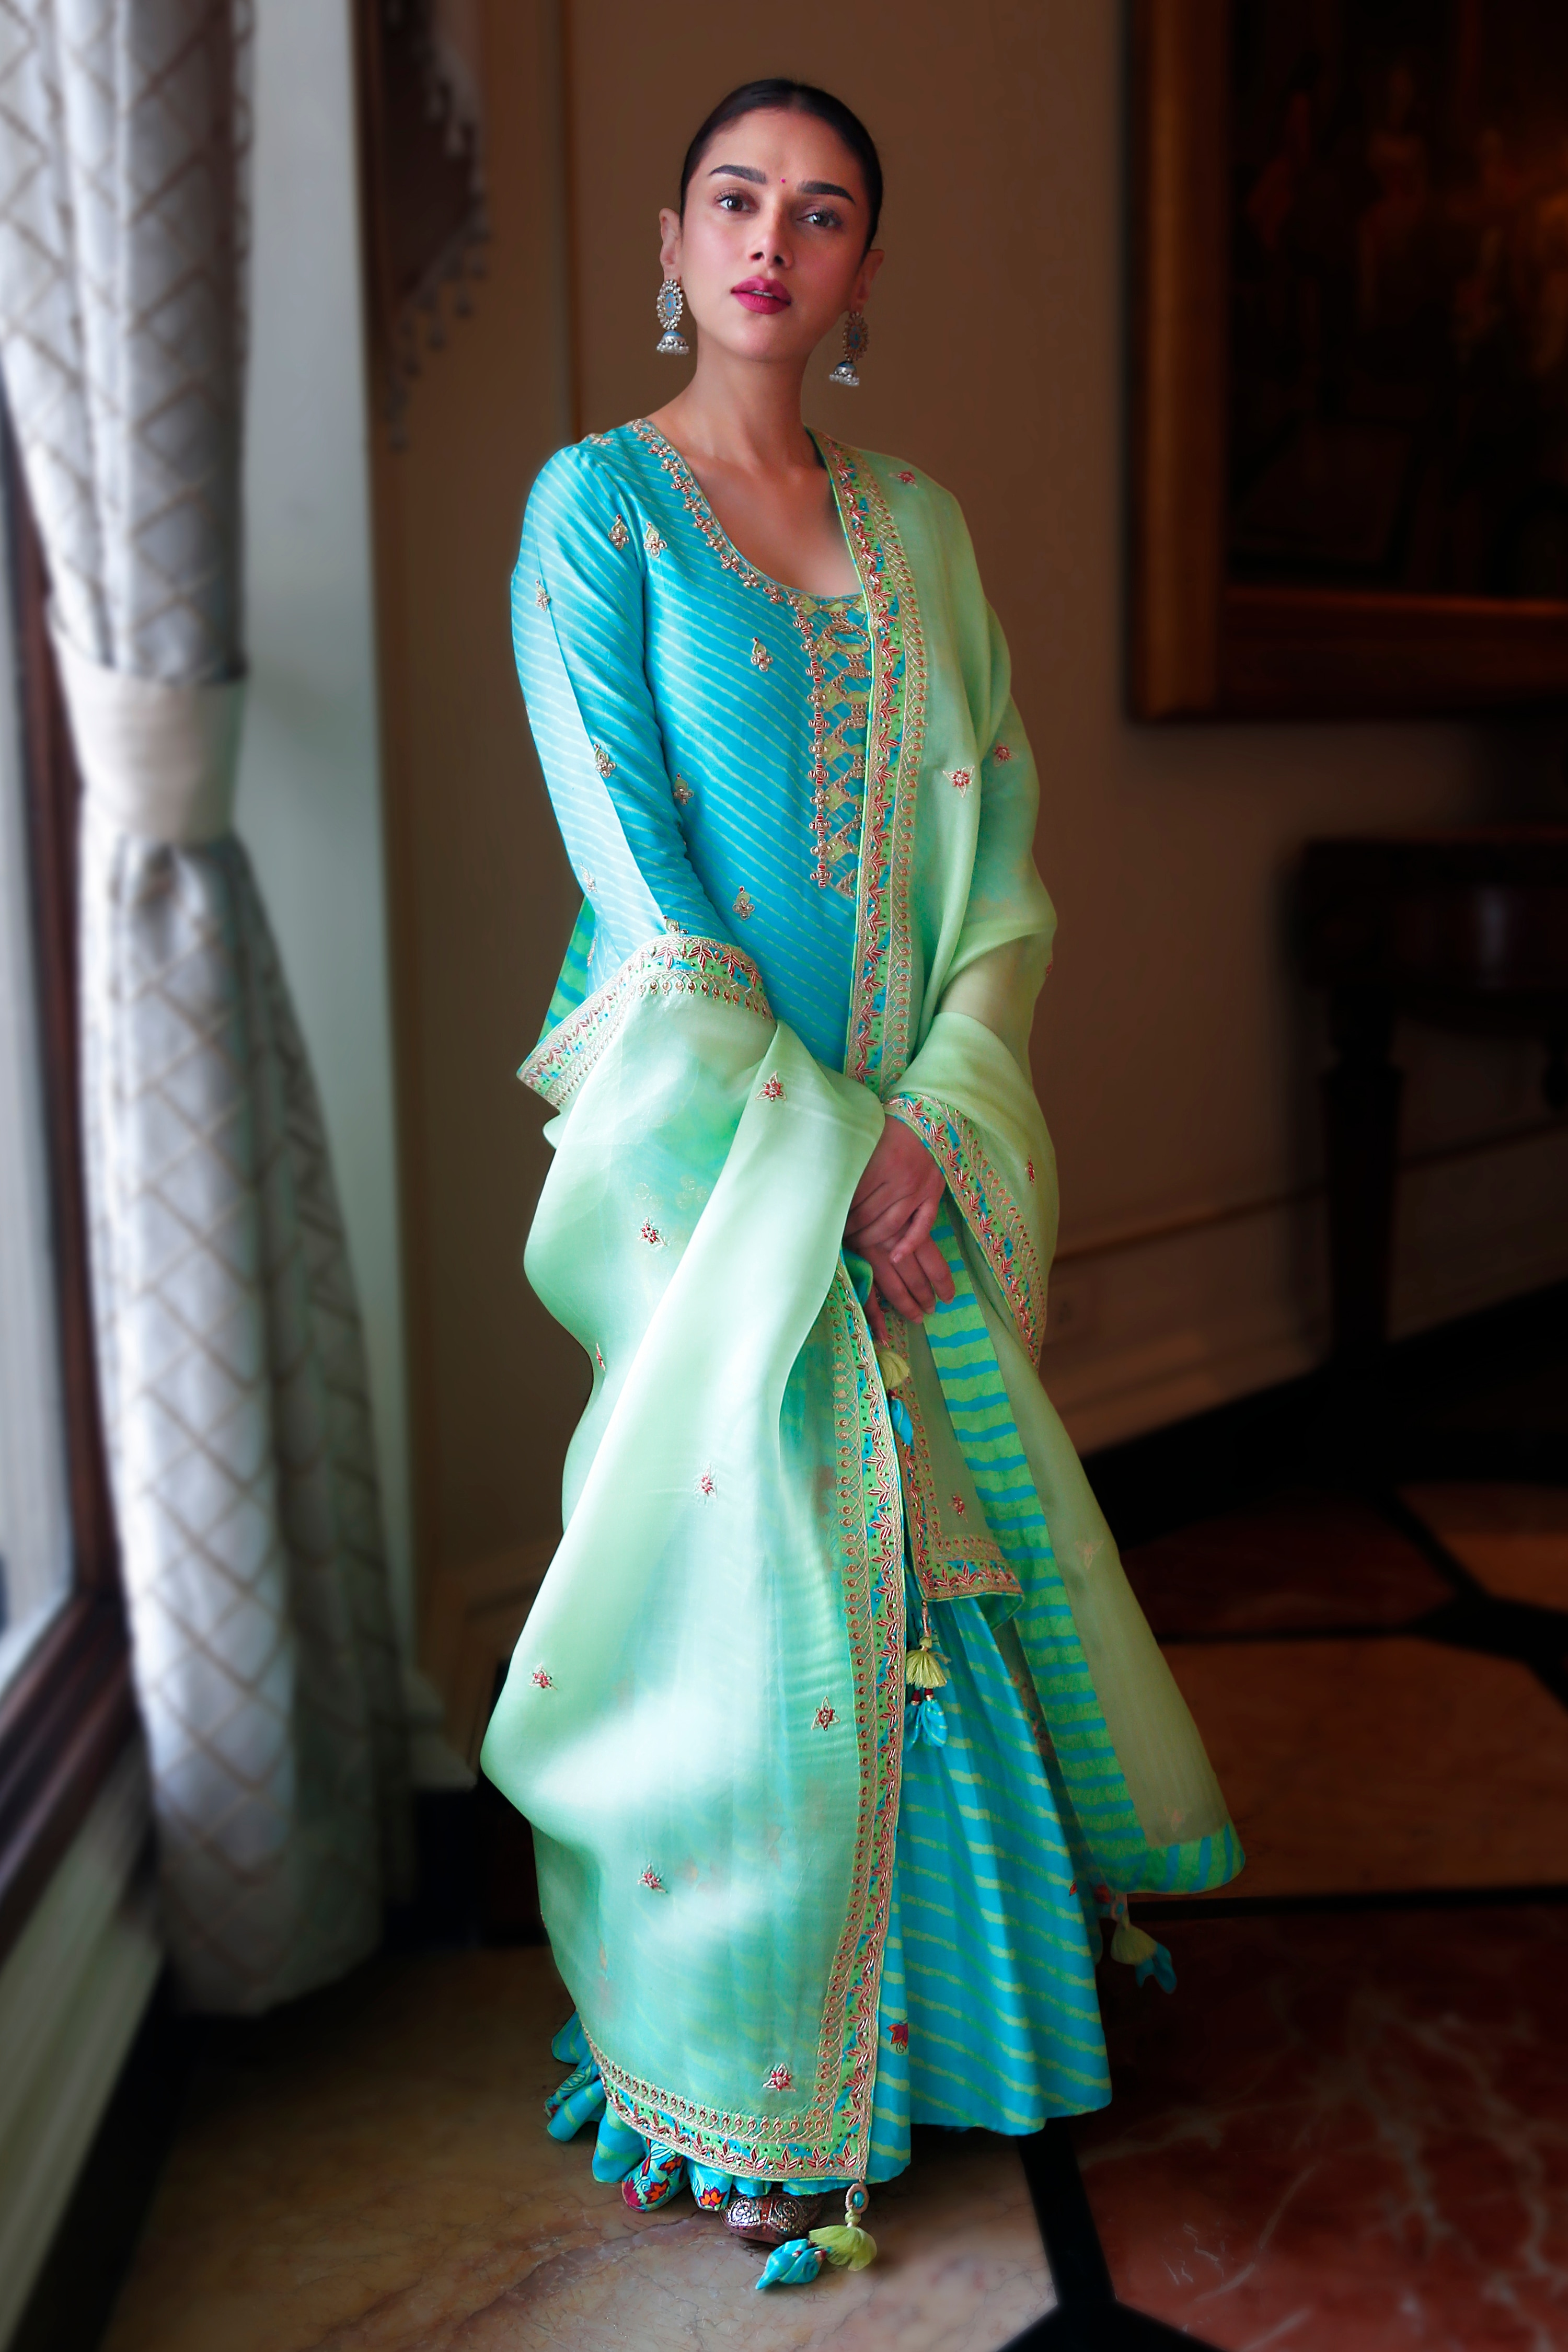 Aditi Rao Hydari in turquoise gharara set(Team Punit Balana)